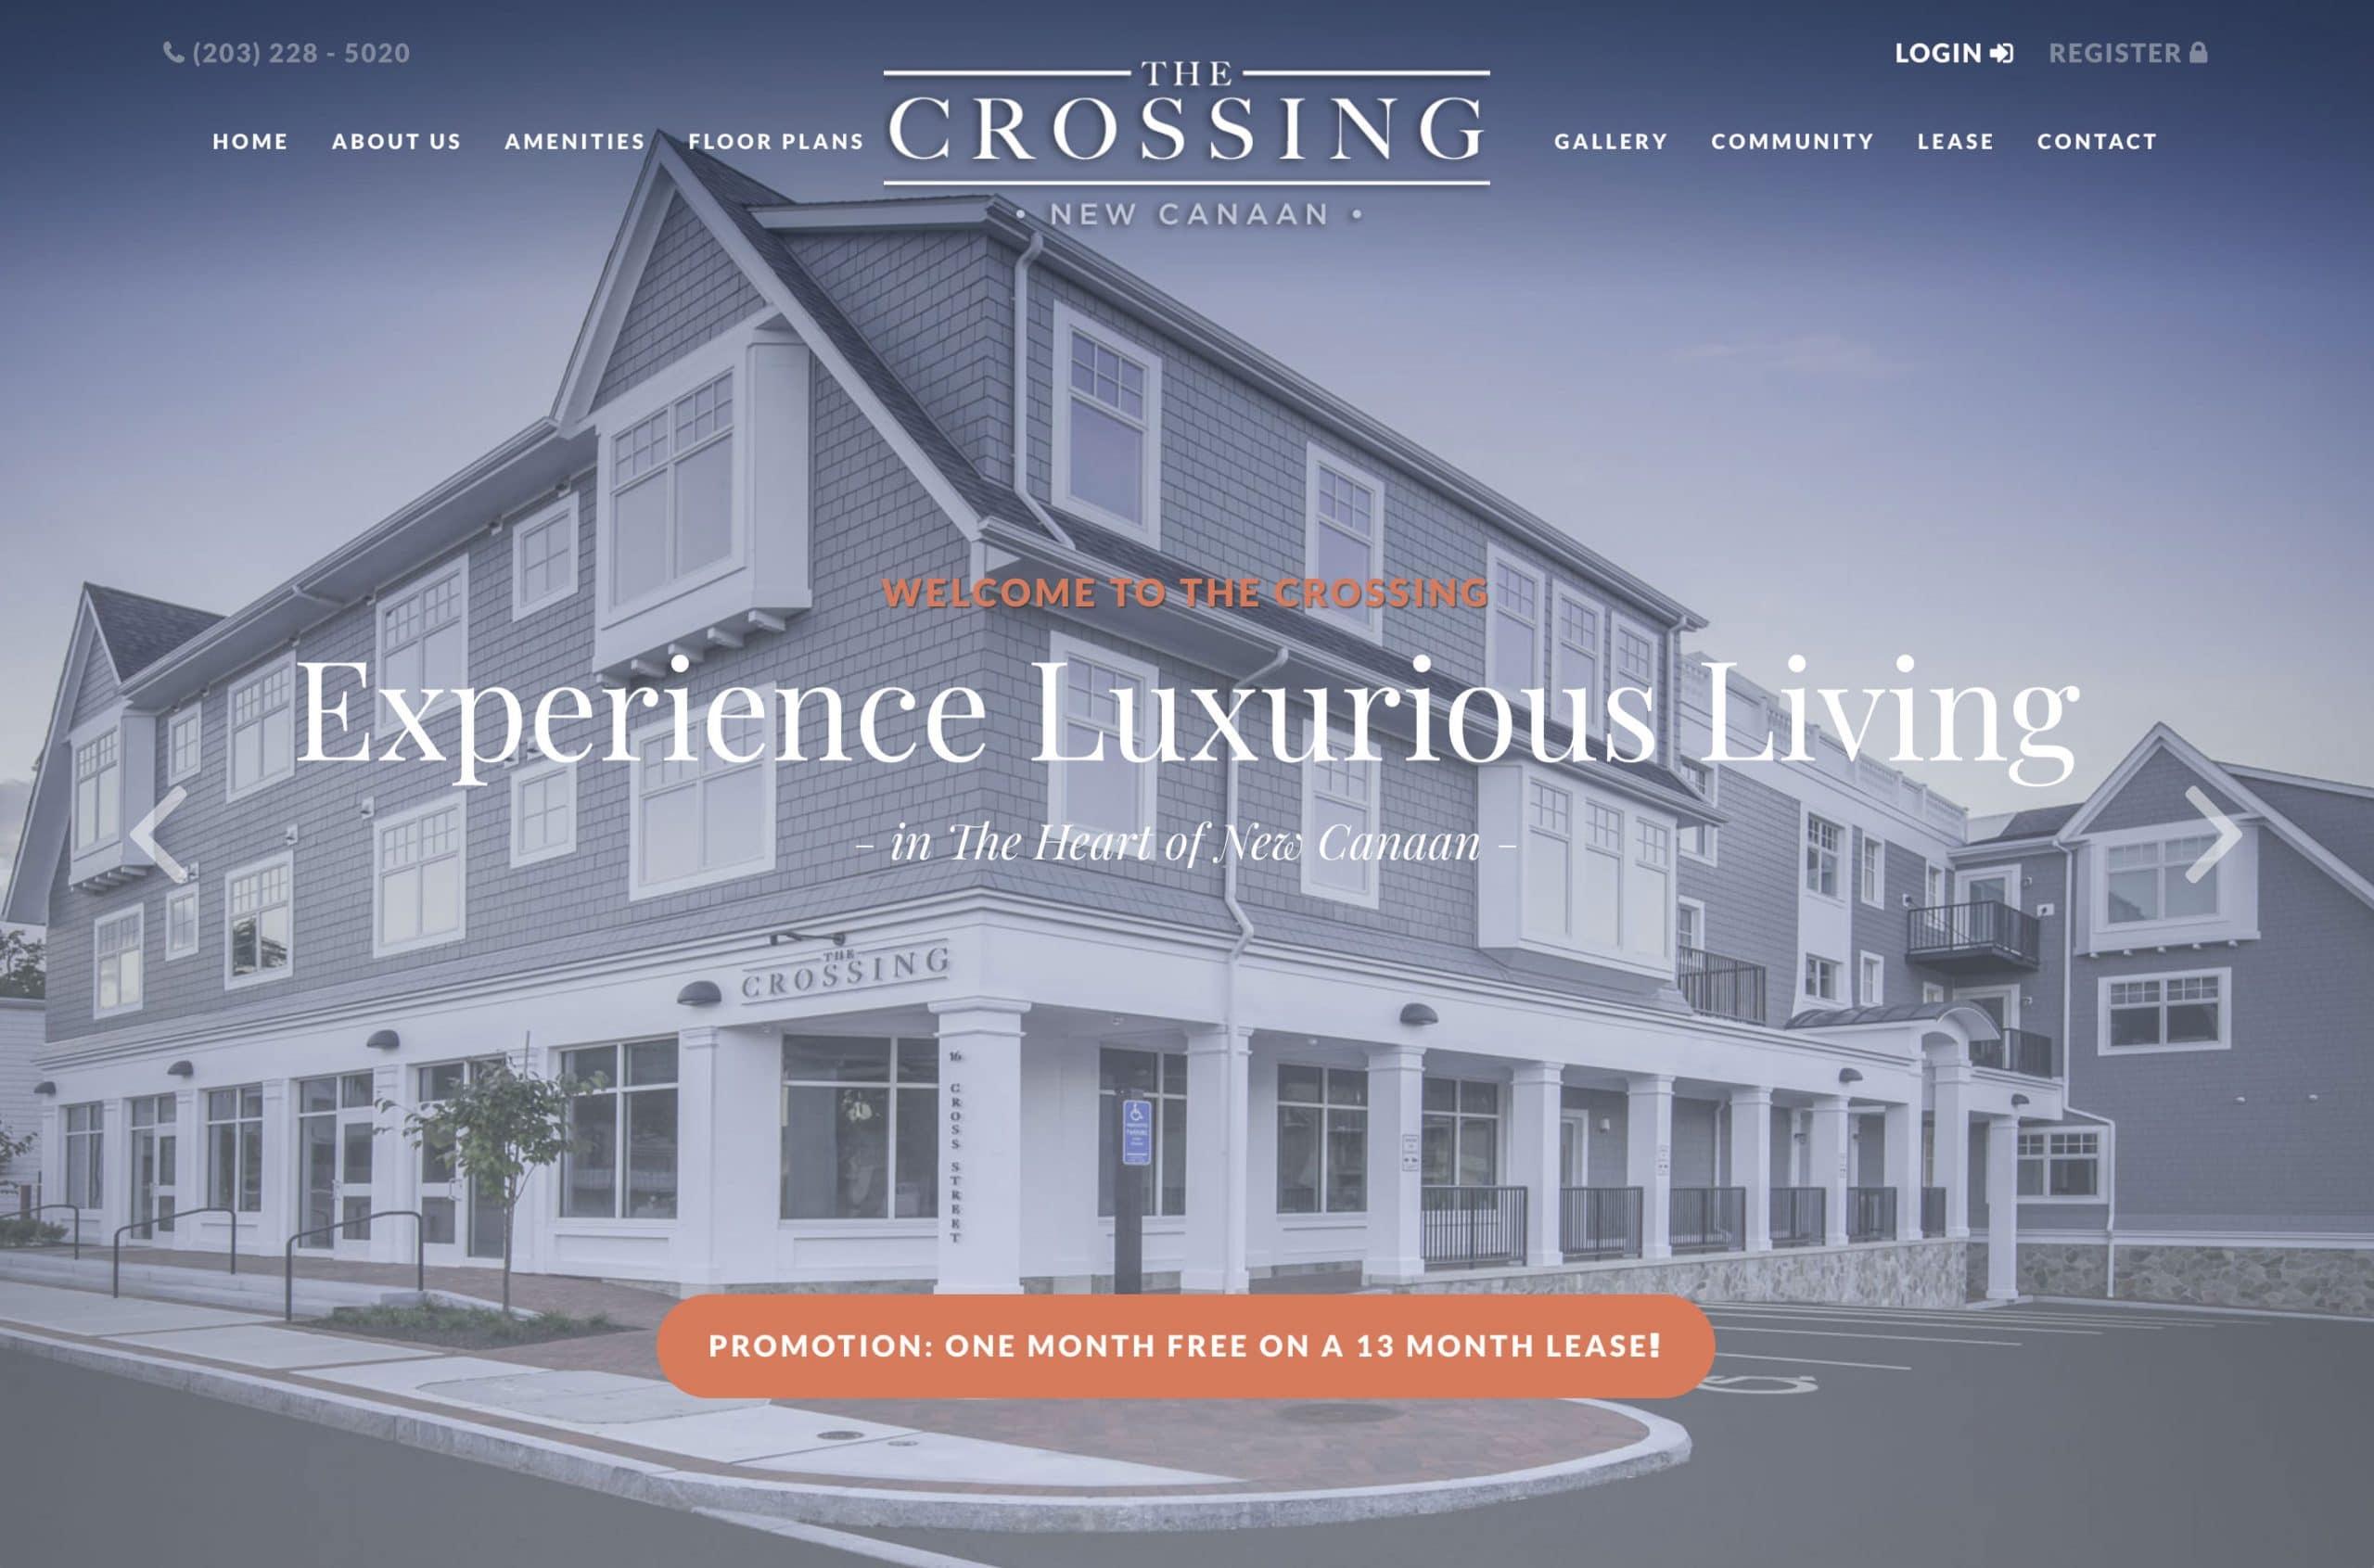 The Crossing Apartment Complex Website